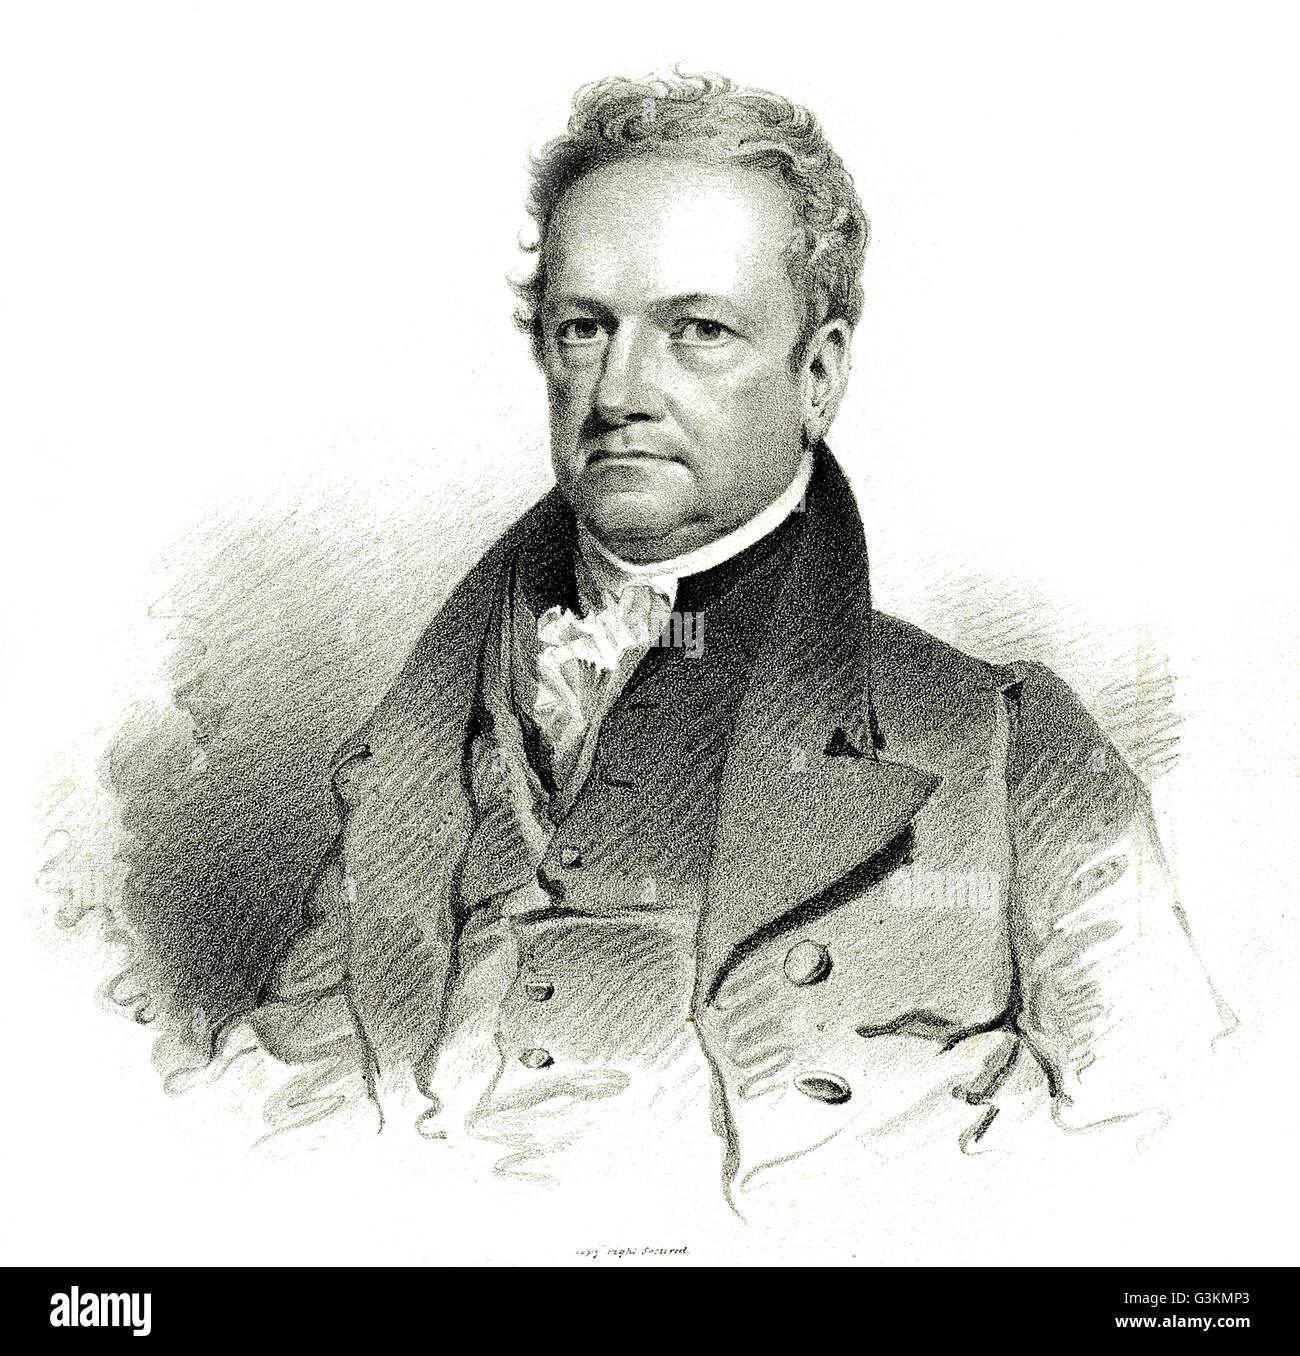 DeWitt Clinton, 1769 - 1828 - Stock Image